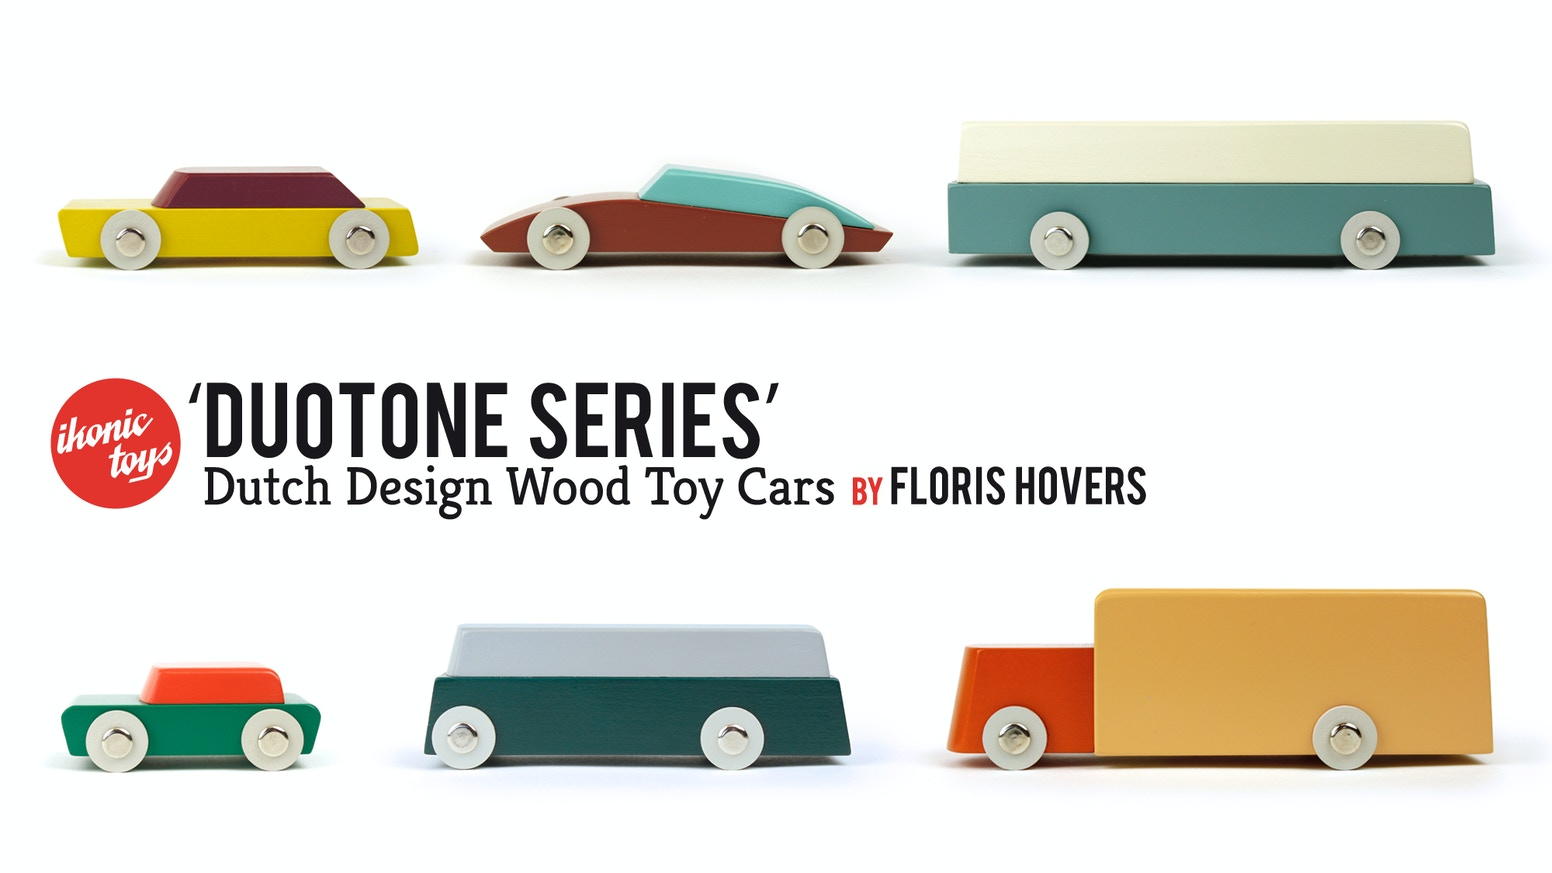 dutch design wood toy carsikonic toys (maurice doorduyn